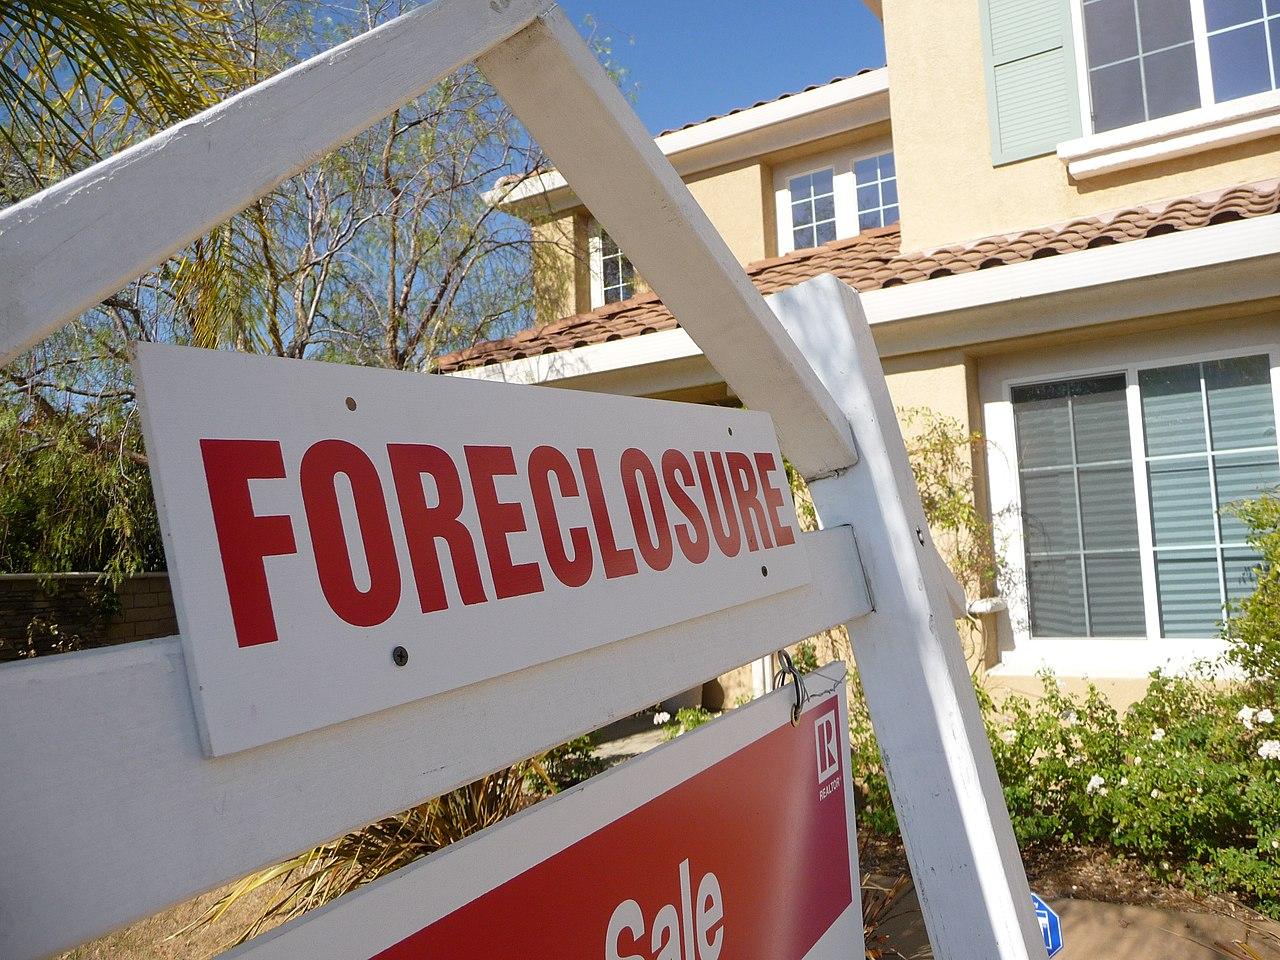 Camden County Foreclosure Attorneys